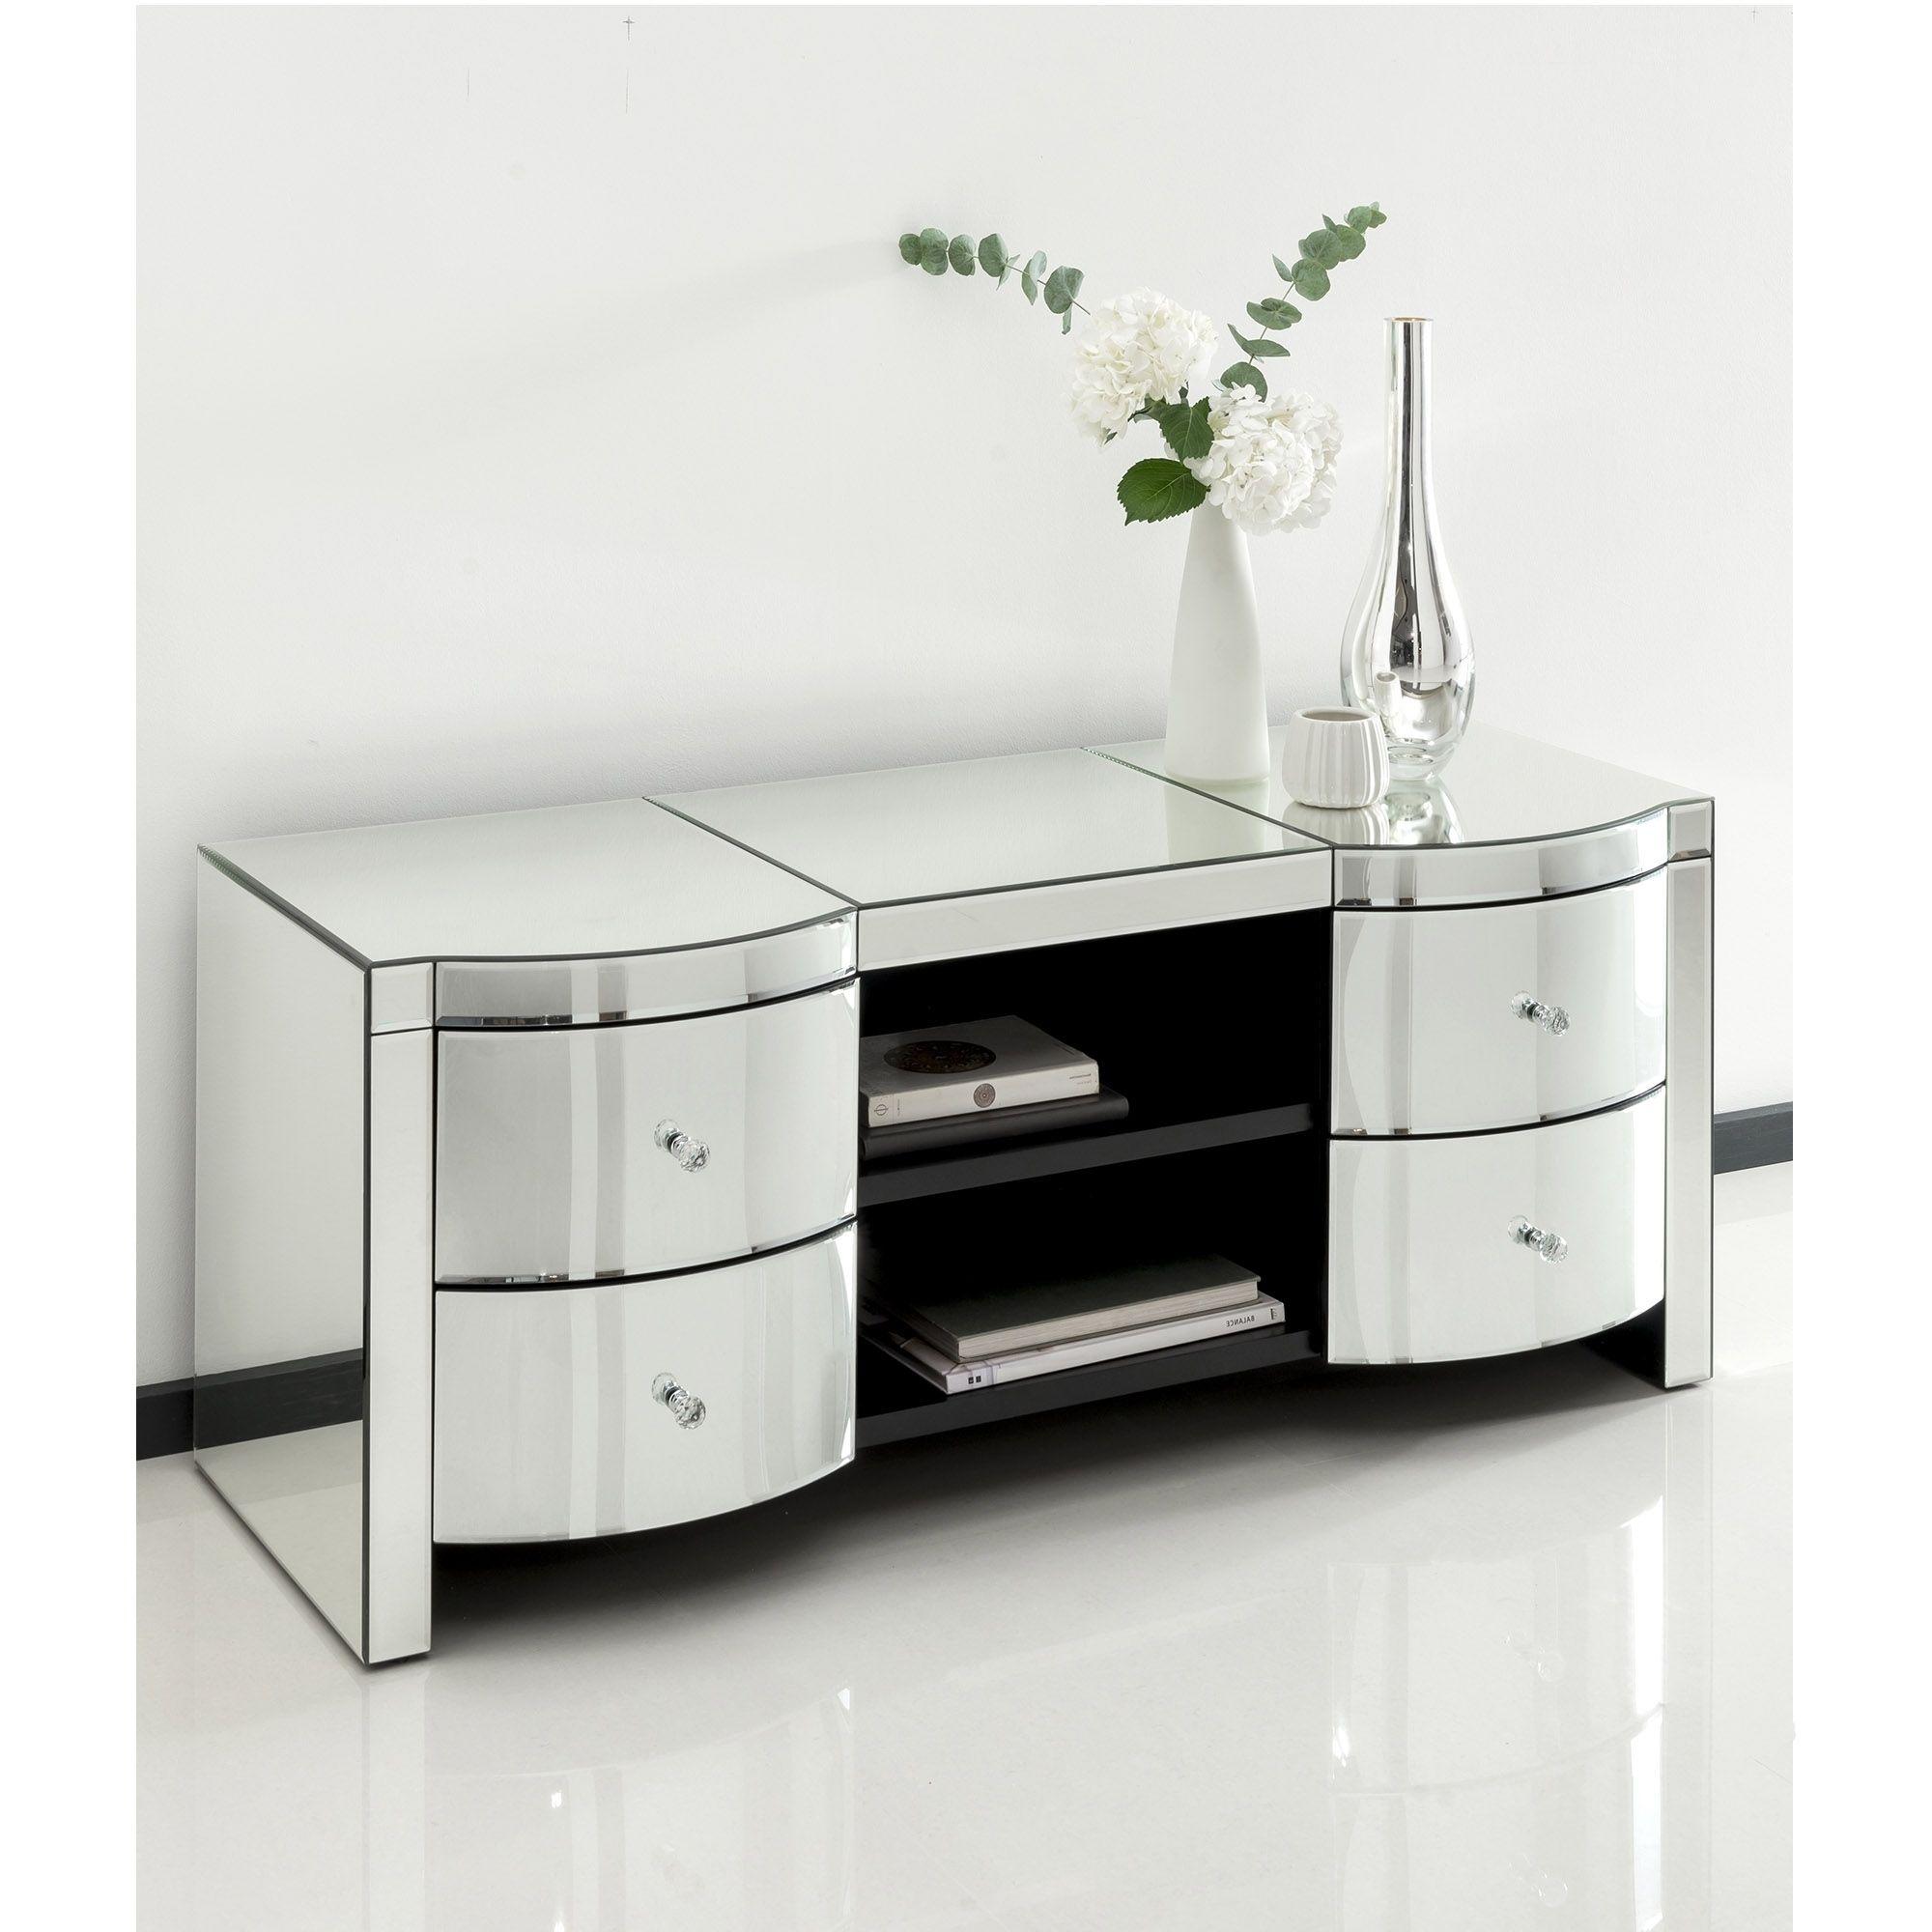 Romano Crystal Mirrored TV Cabinet | Venetian Mirrored Furniture ...